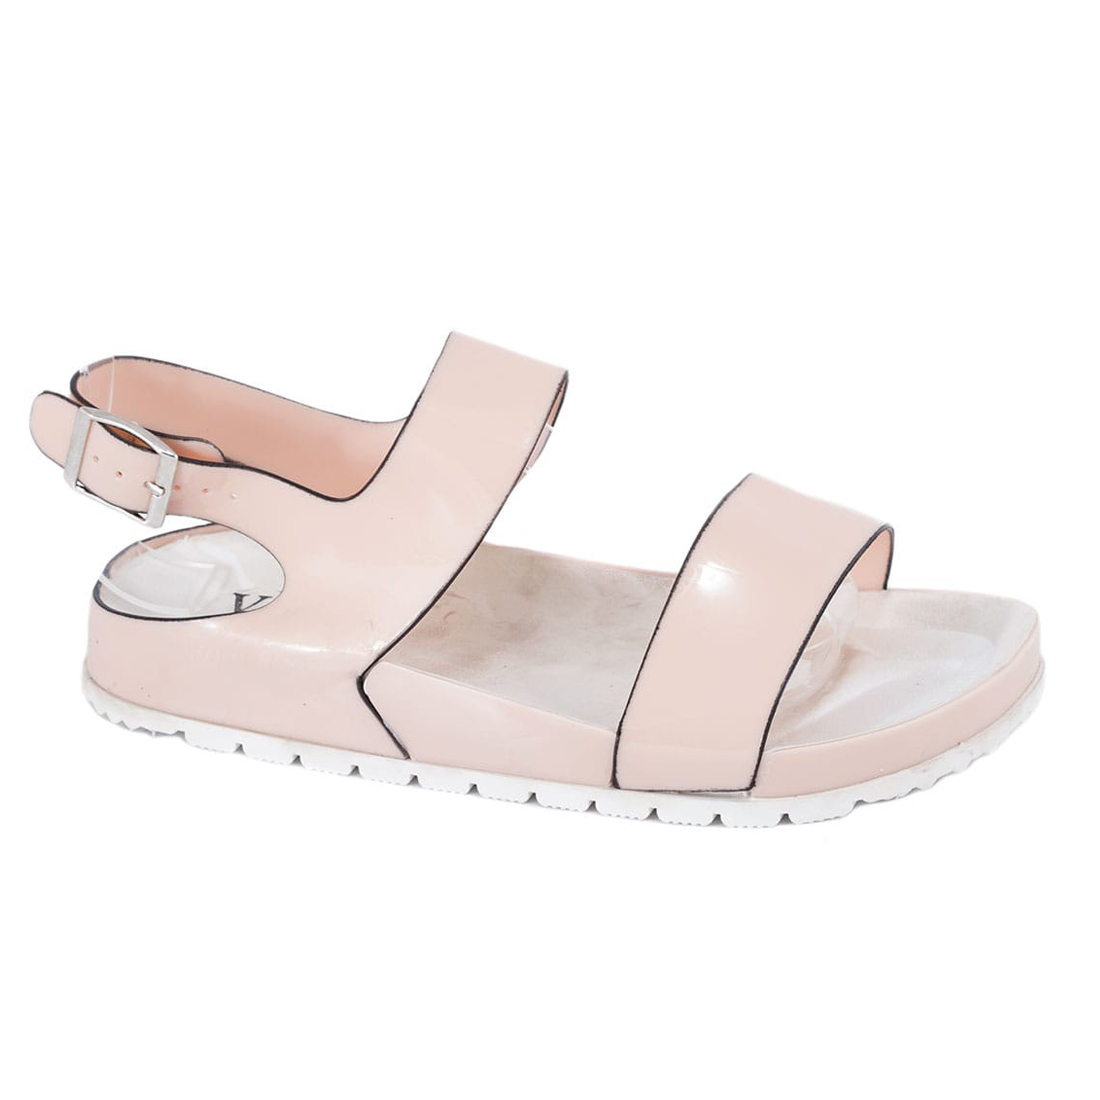 Sandale din cauciuc bej S888B